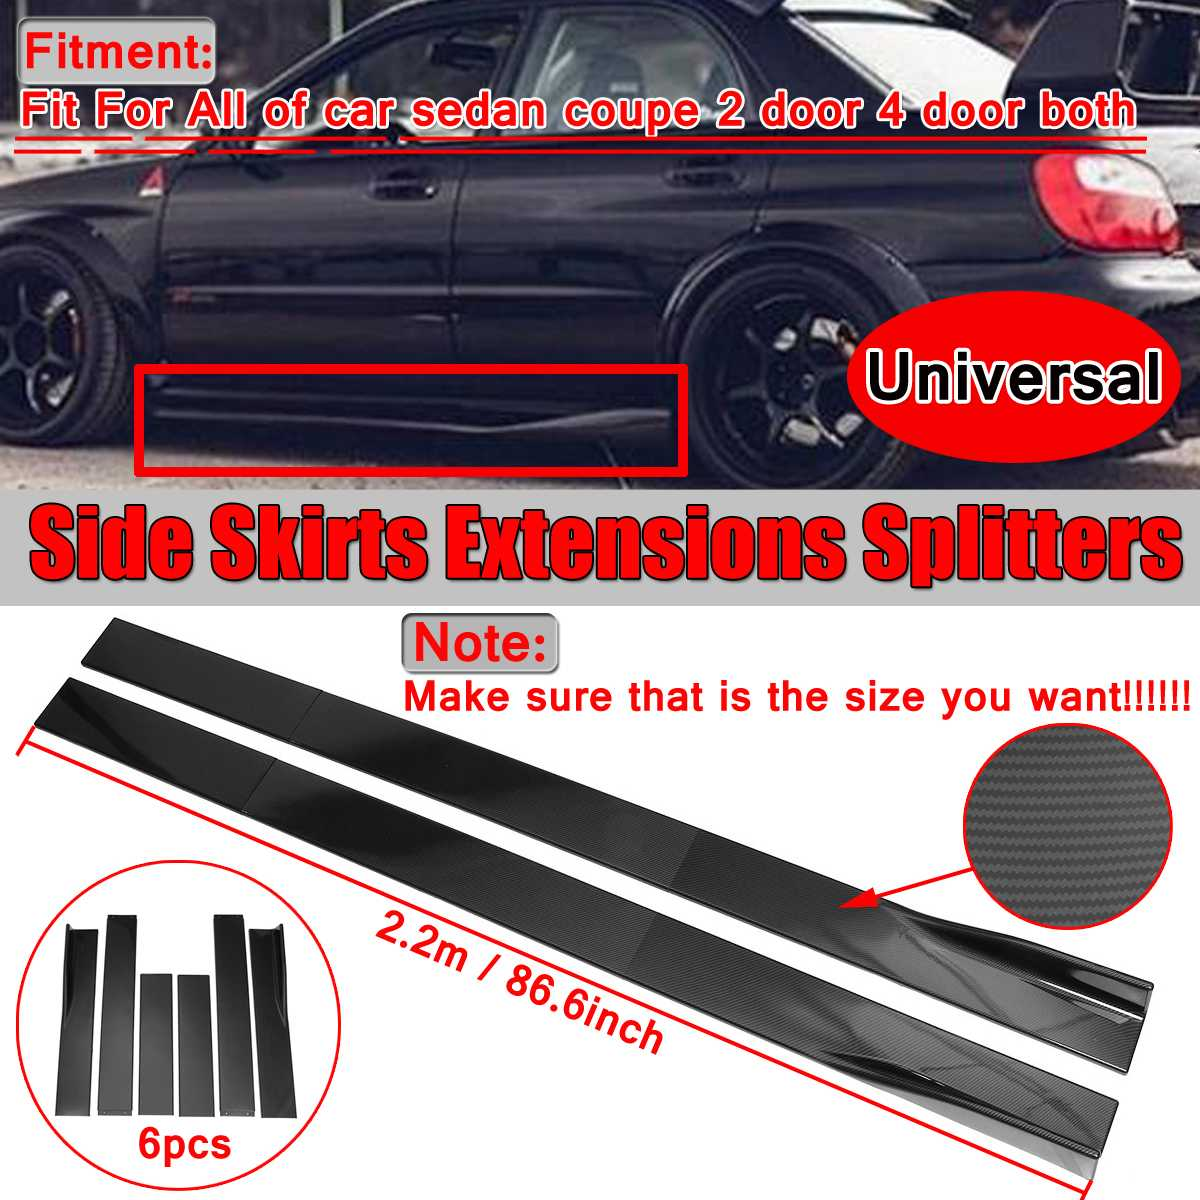 6PCS คาร์บอน/สีดำ 2 M/2.2 M Universal ด้านข้างกระโปรงยาวด้านข้างกระโปรง Winglet Splitters สำหรับ BMW สำหรับ Benz สำหรับ Honda